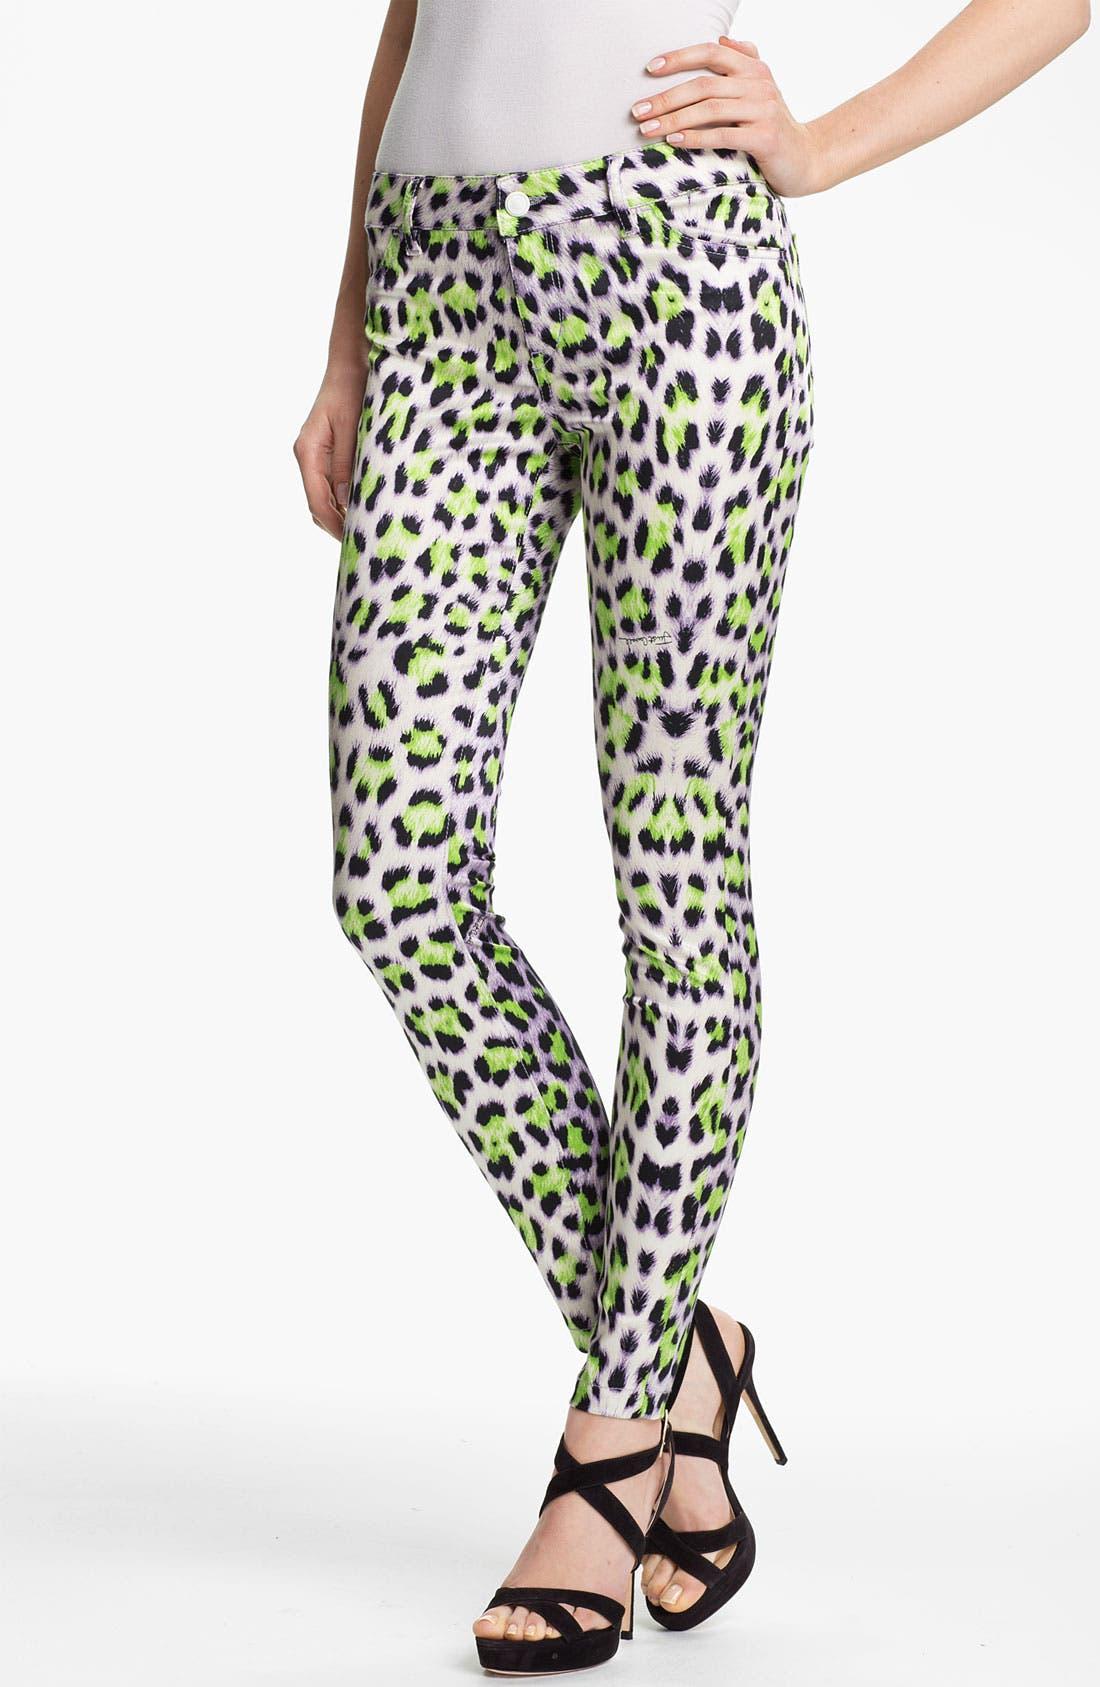 Alternate Image 1 Selected - Just Cavalli Leopard Print Skinny Jeans